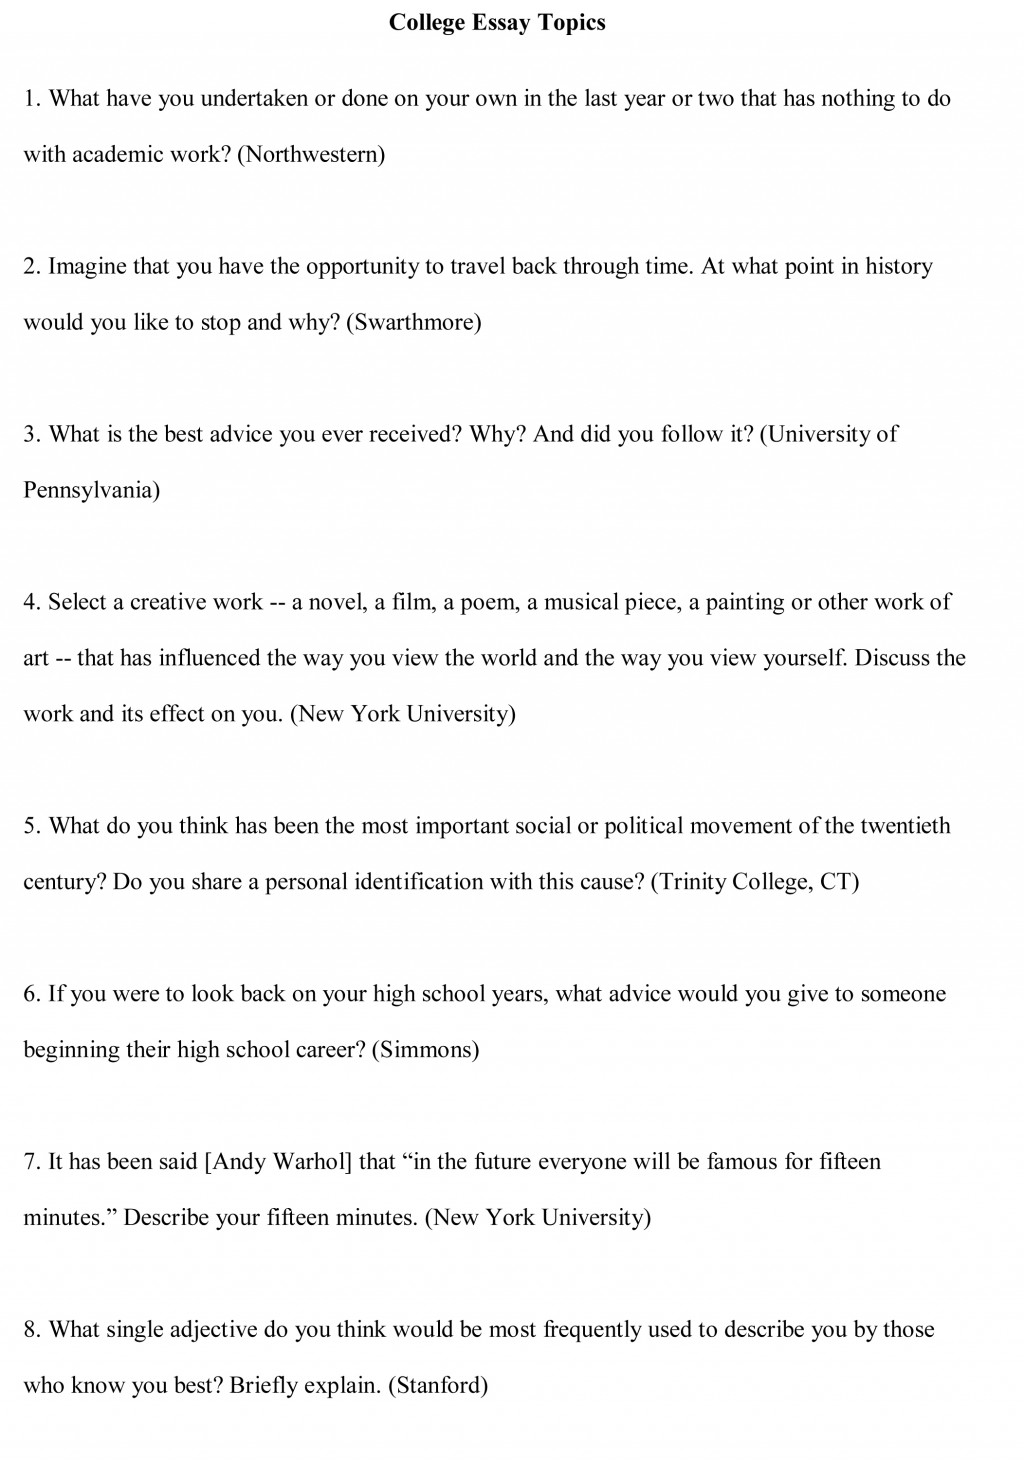 017 College Essay Topics Free Sample1 Good Persuasive Amazing 2018 Uk Argumentative High School Large